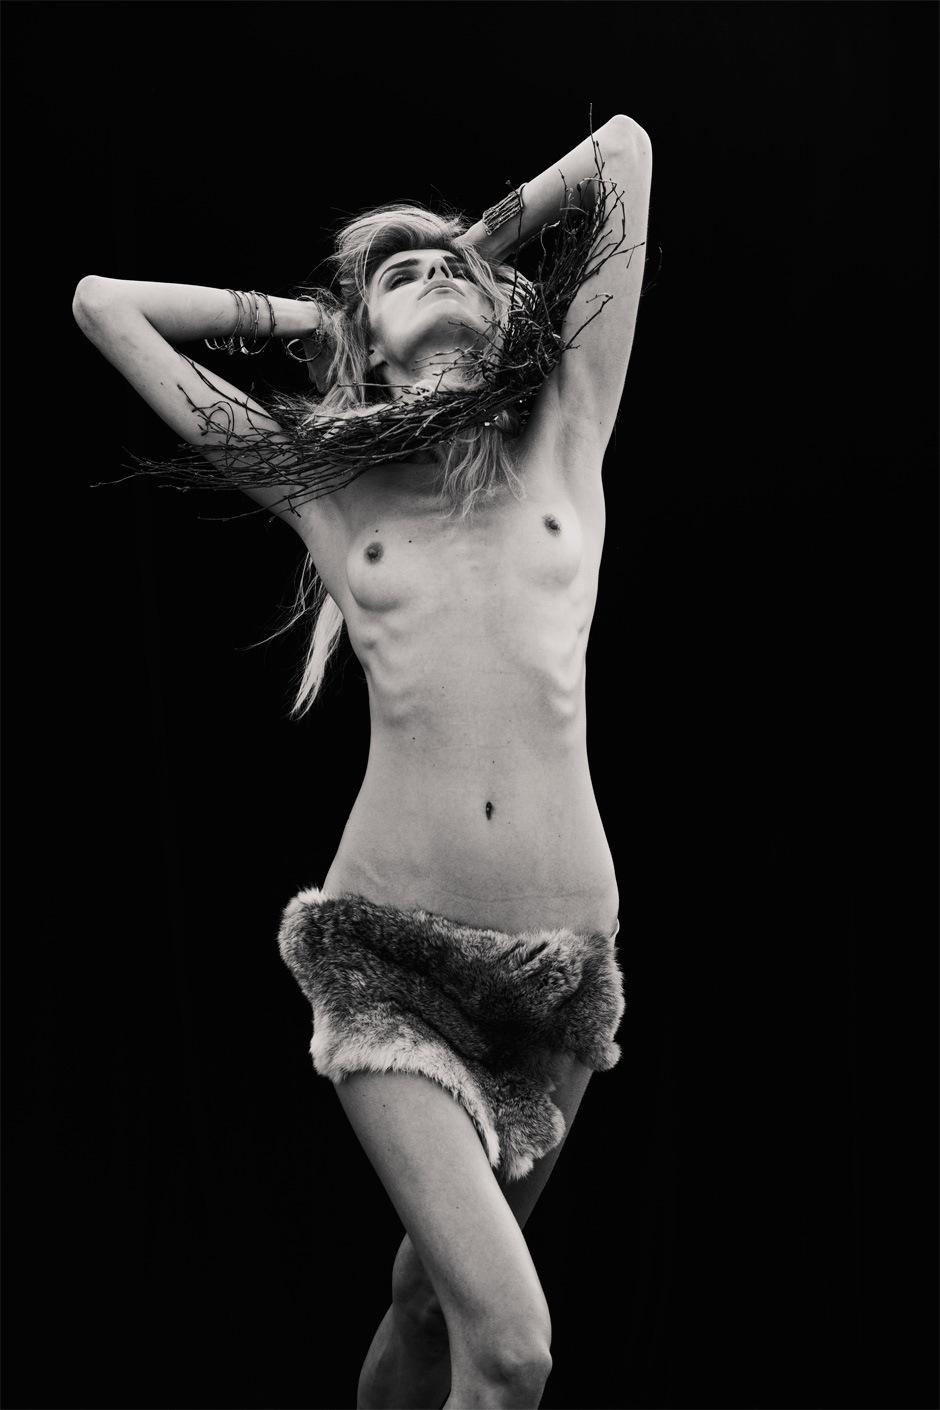 Milena-Aaron_Feaver-Confashion_Magazine-03-fashionising.jpeg